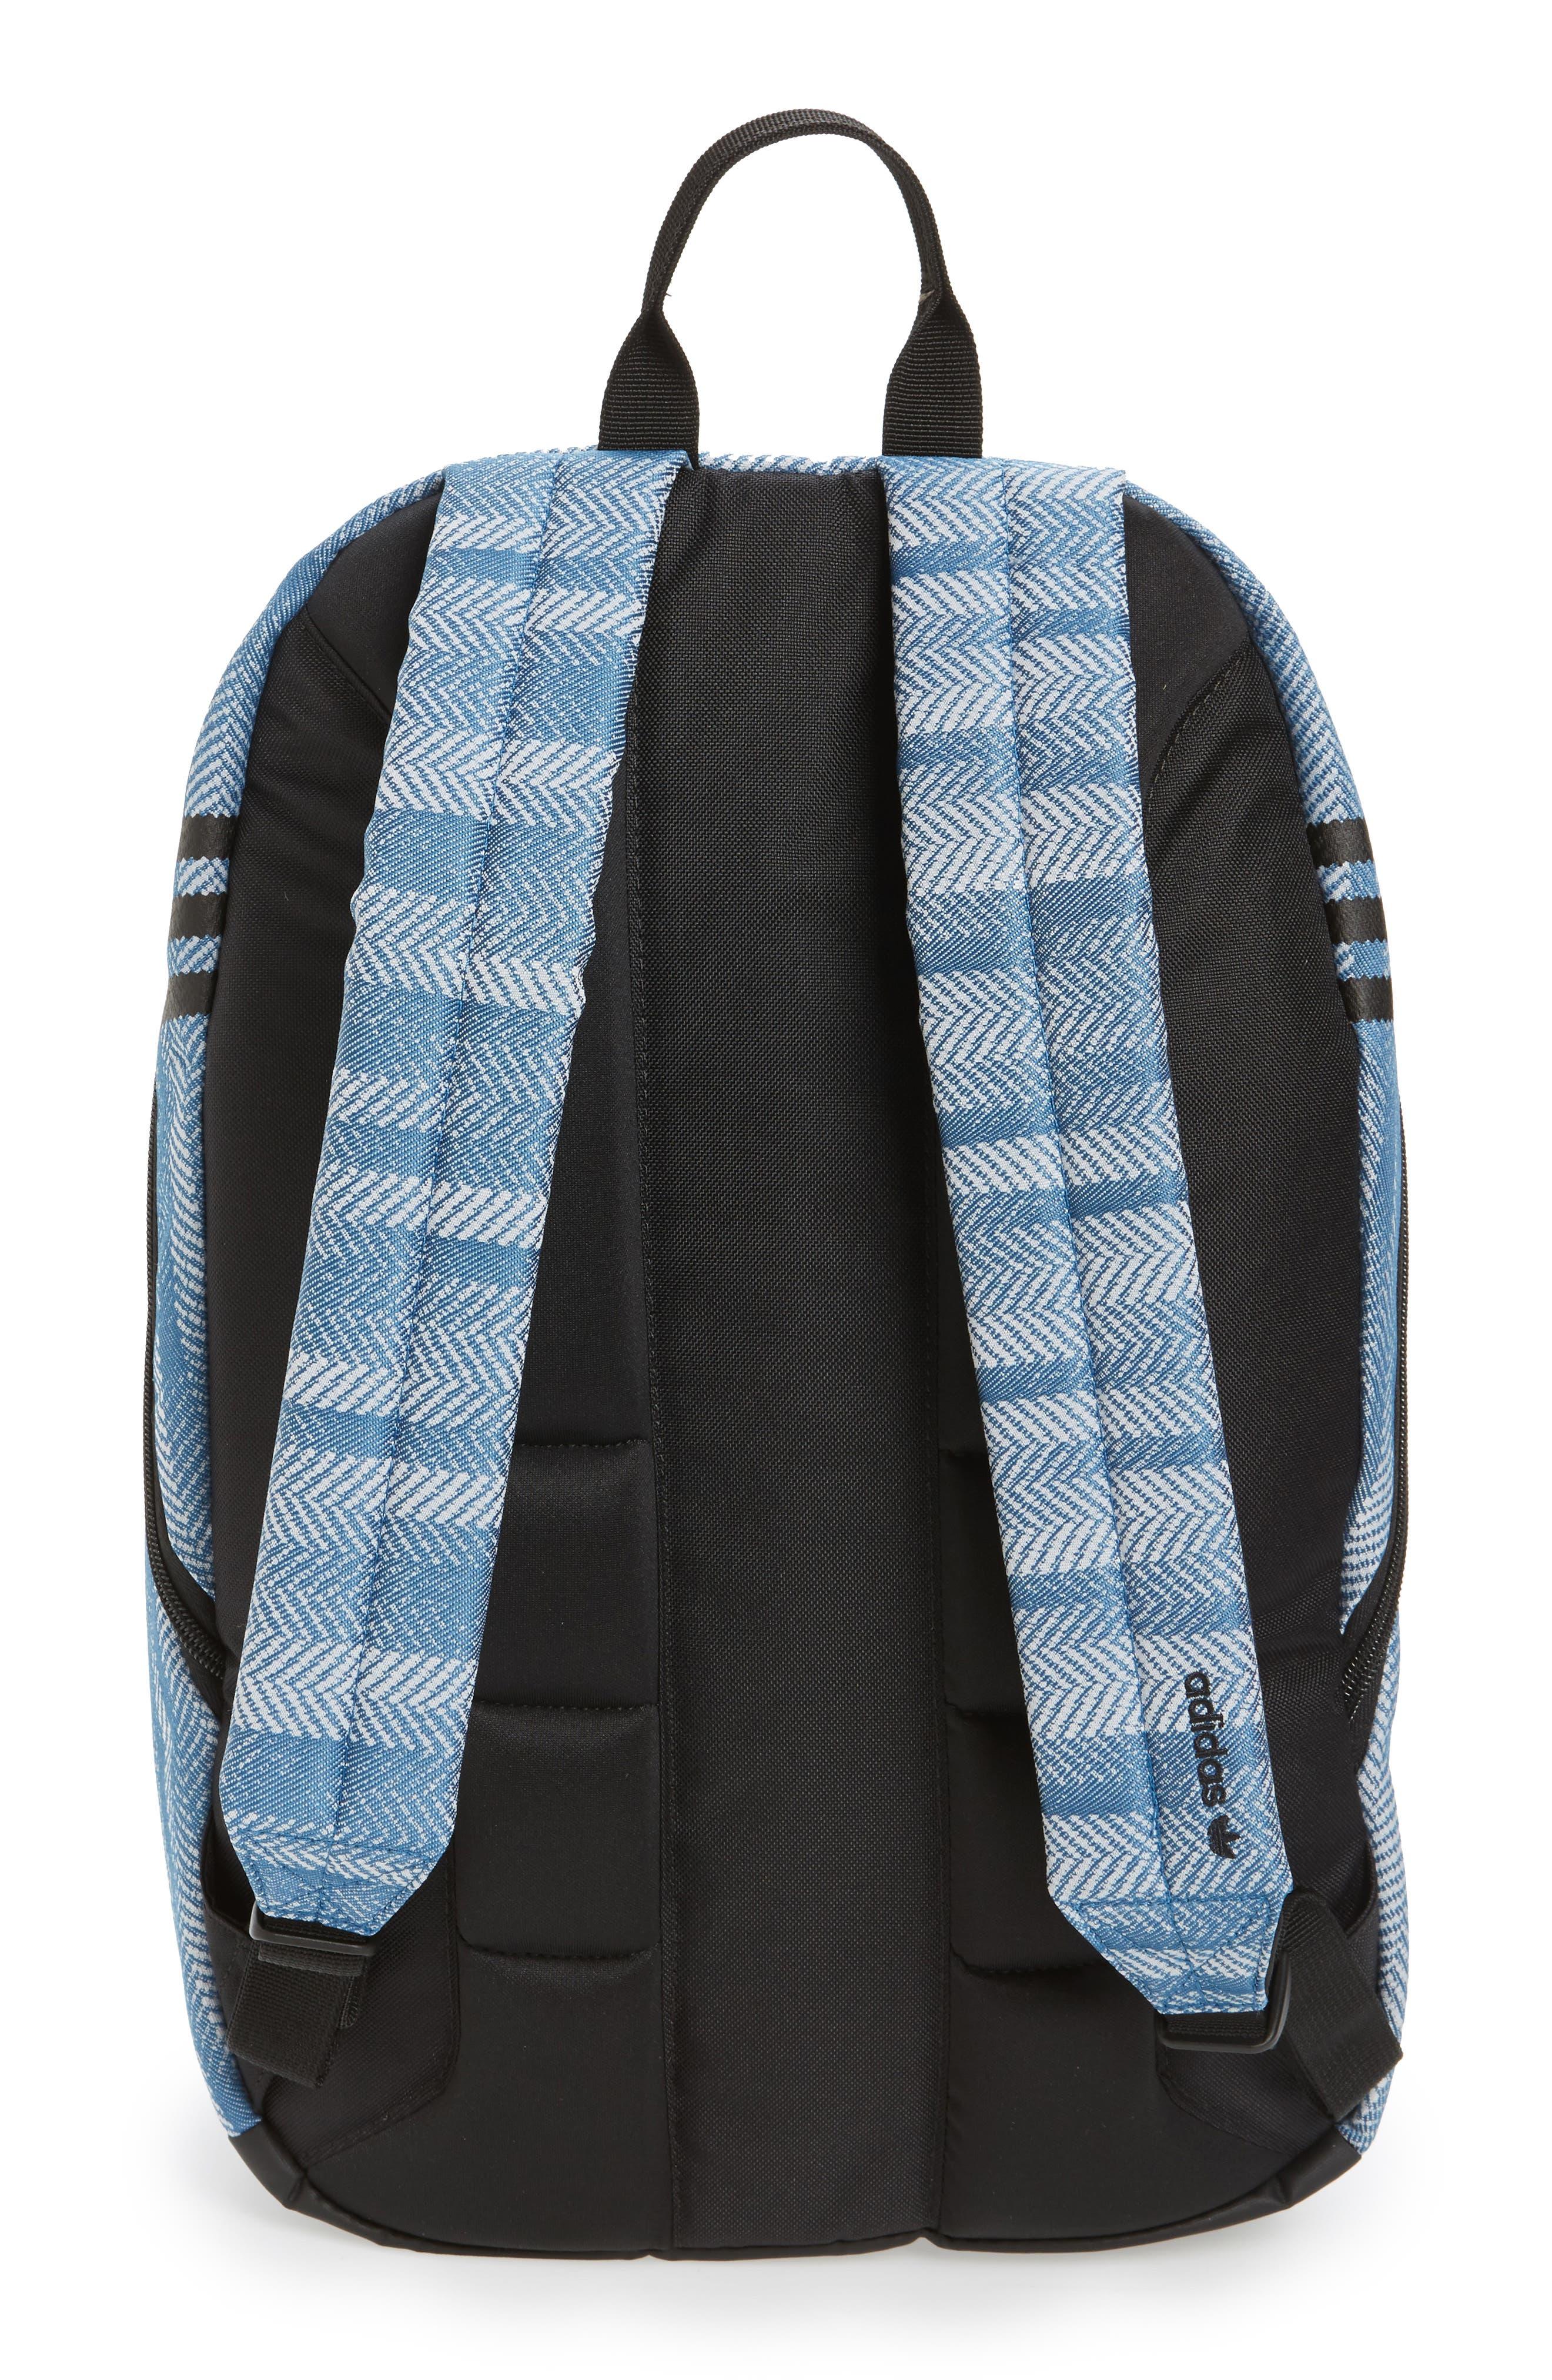 NTL Plus Backpack,                             Alternate thumbnail 3, color,                             CORE BLUE/ BLACK